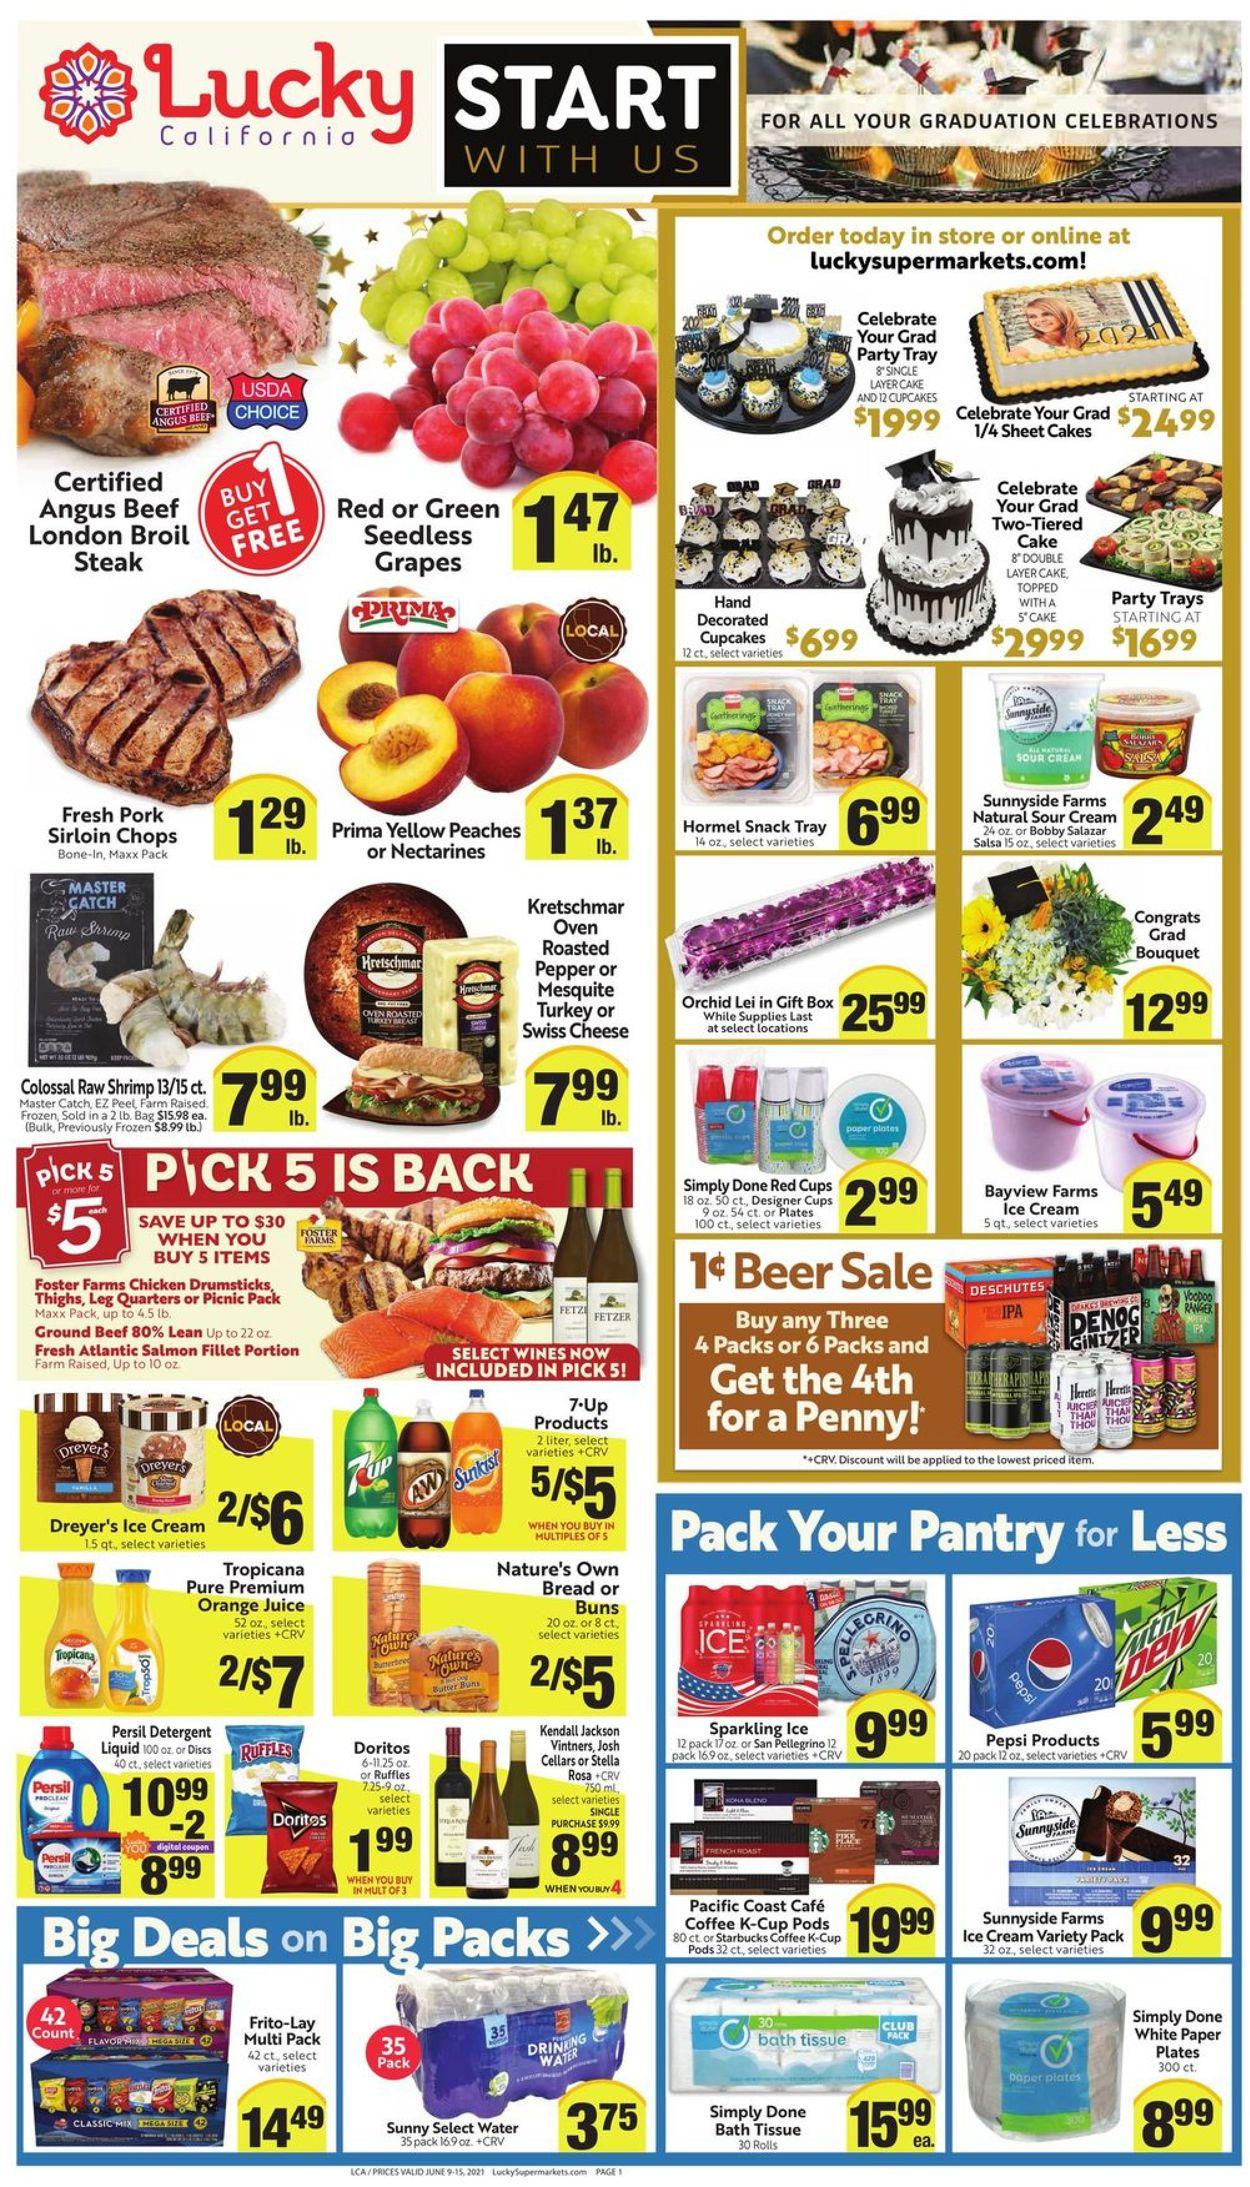 Lucky Supermarkets Weekly Ad Circular - valid 06/09-06/15/2021